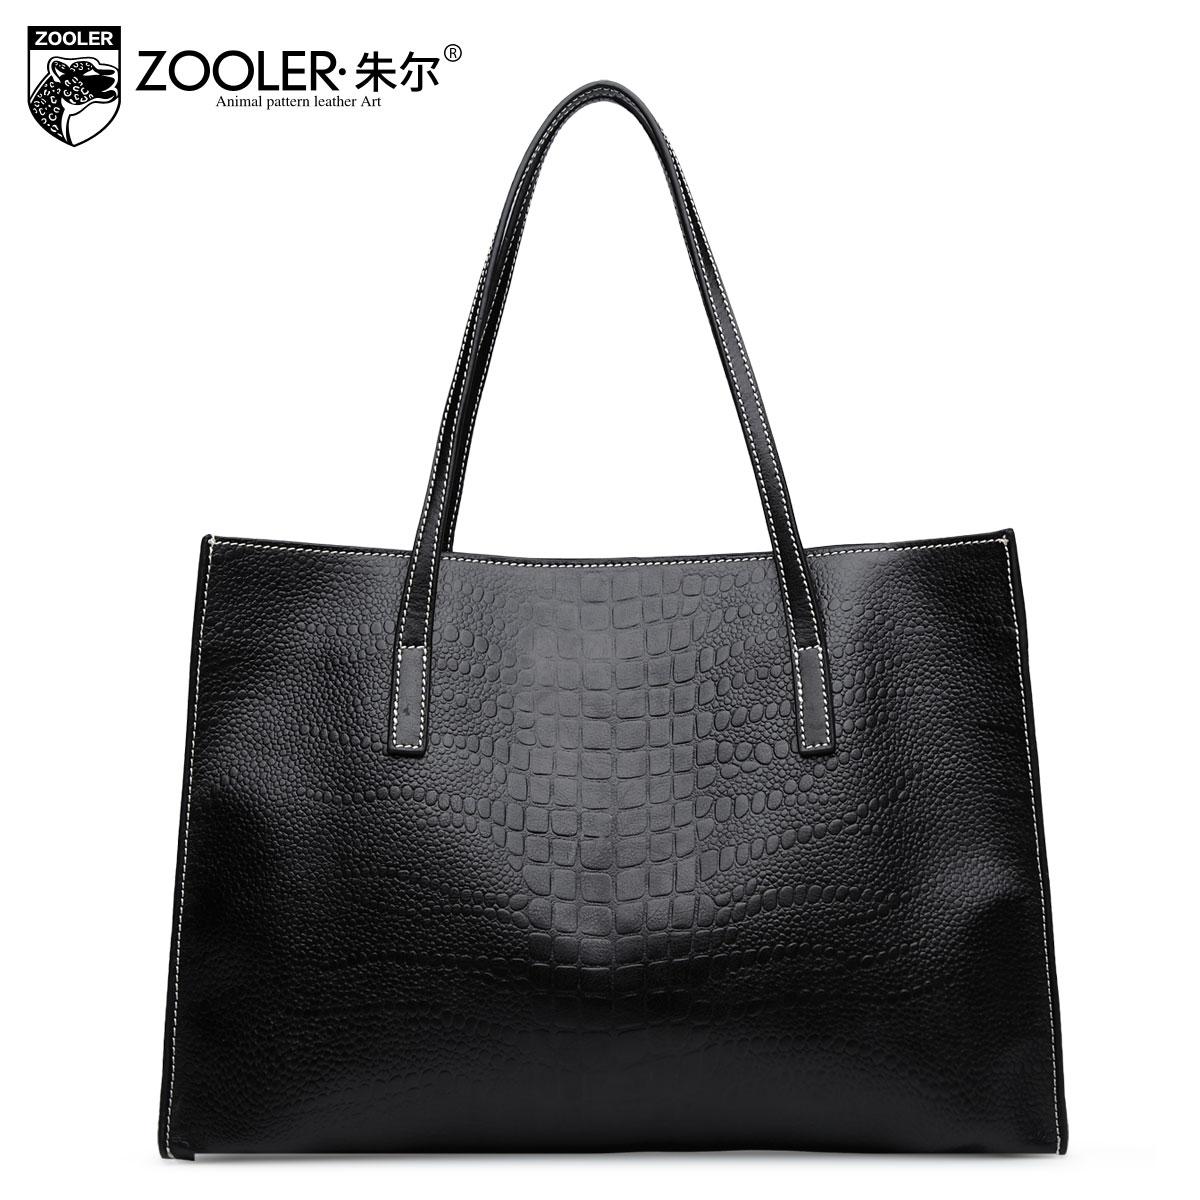 Fashion shopping bag 2015 cowhide large bag casual women's handbag women's bags female big shoulder bag